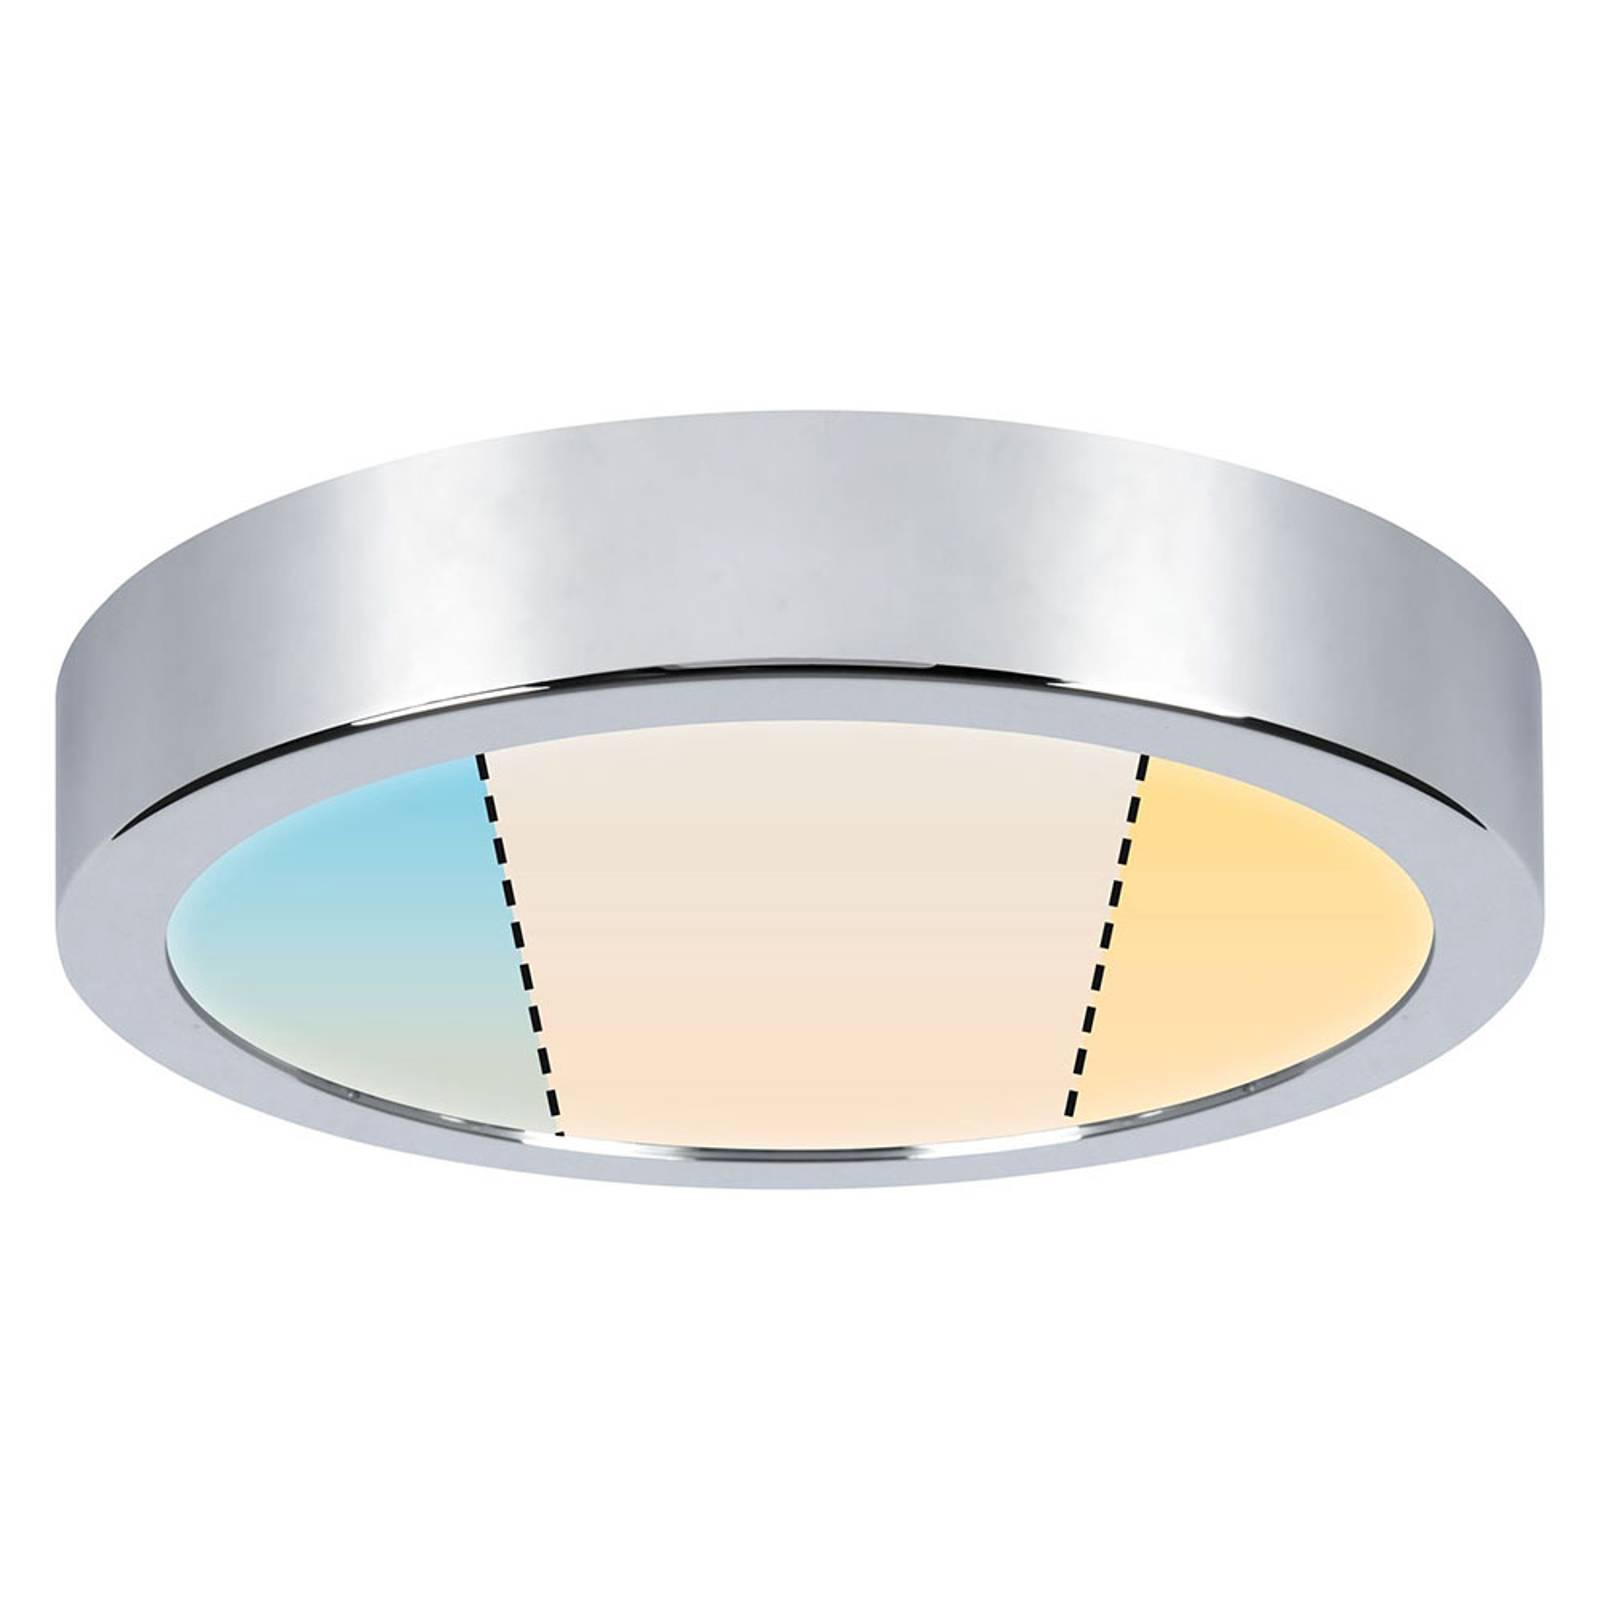 Paulmann Aviar -LED-kattolamppu WhiteSwitch Ø 22cm